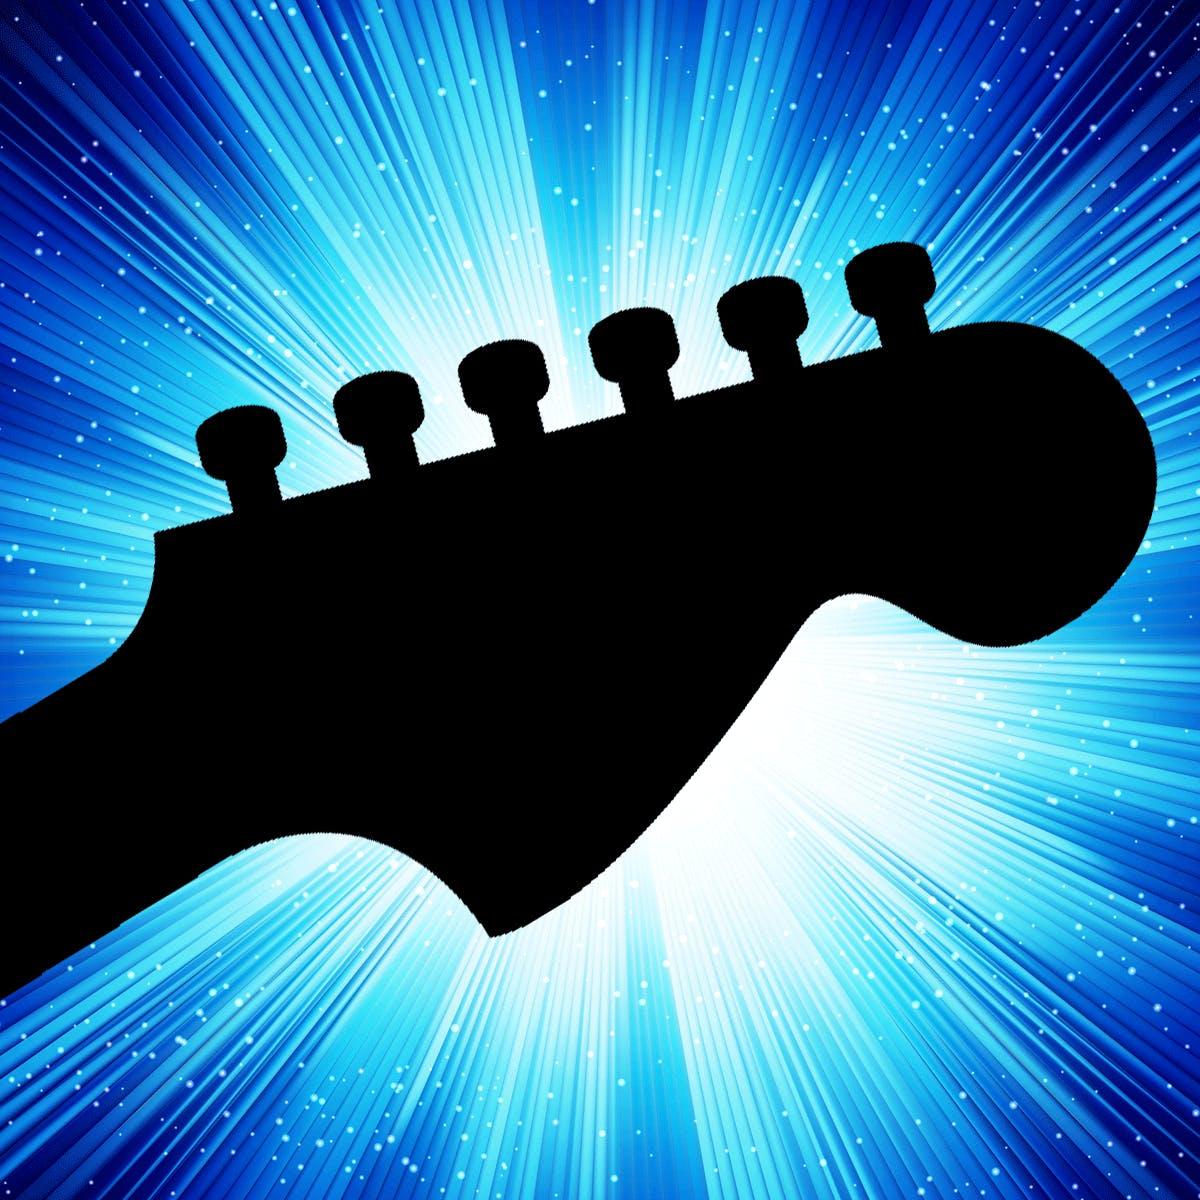 Music\'s Big Bang: The Genesis of Rock \'n\' Roll